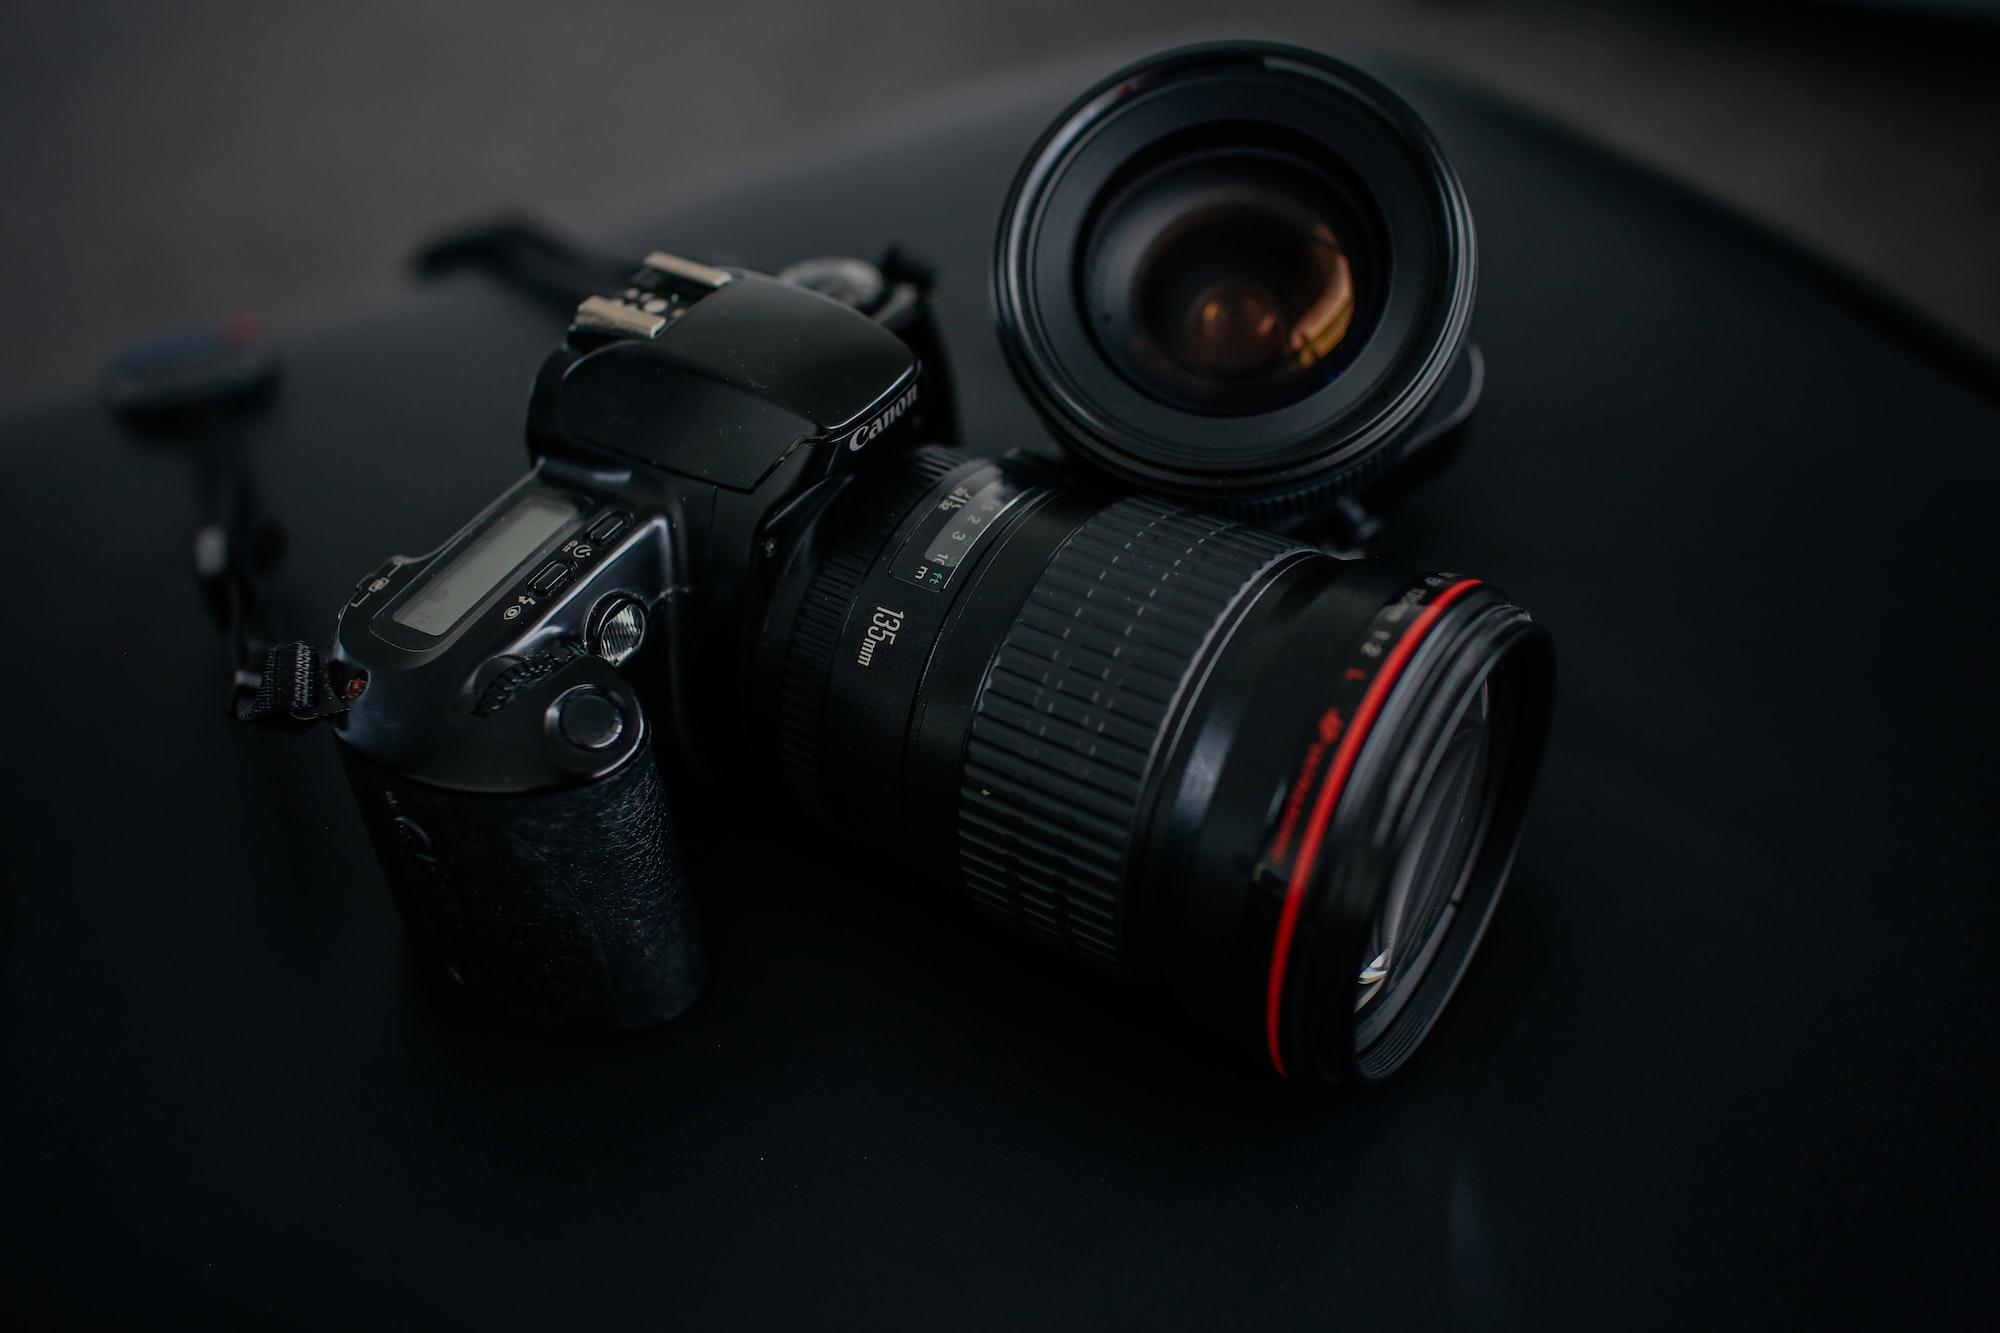 Canon camera 135mm lens